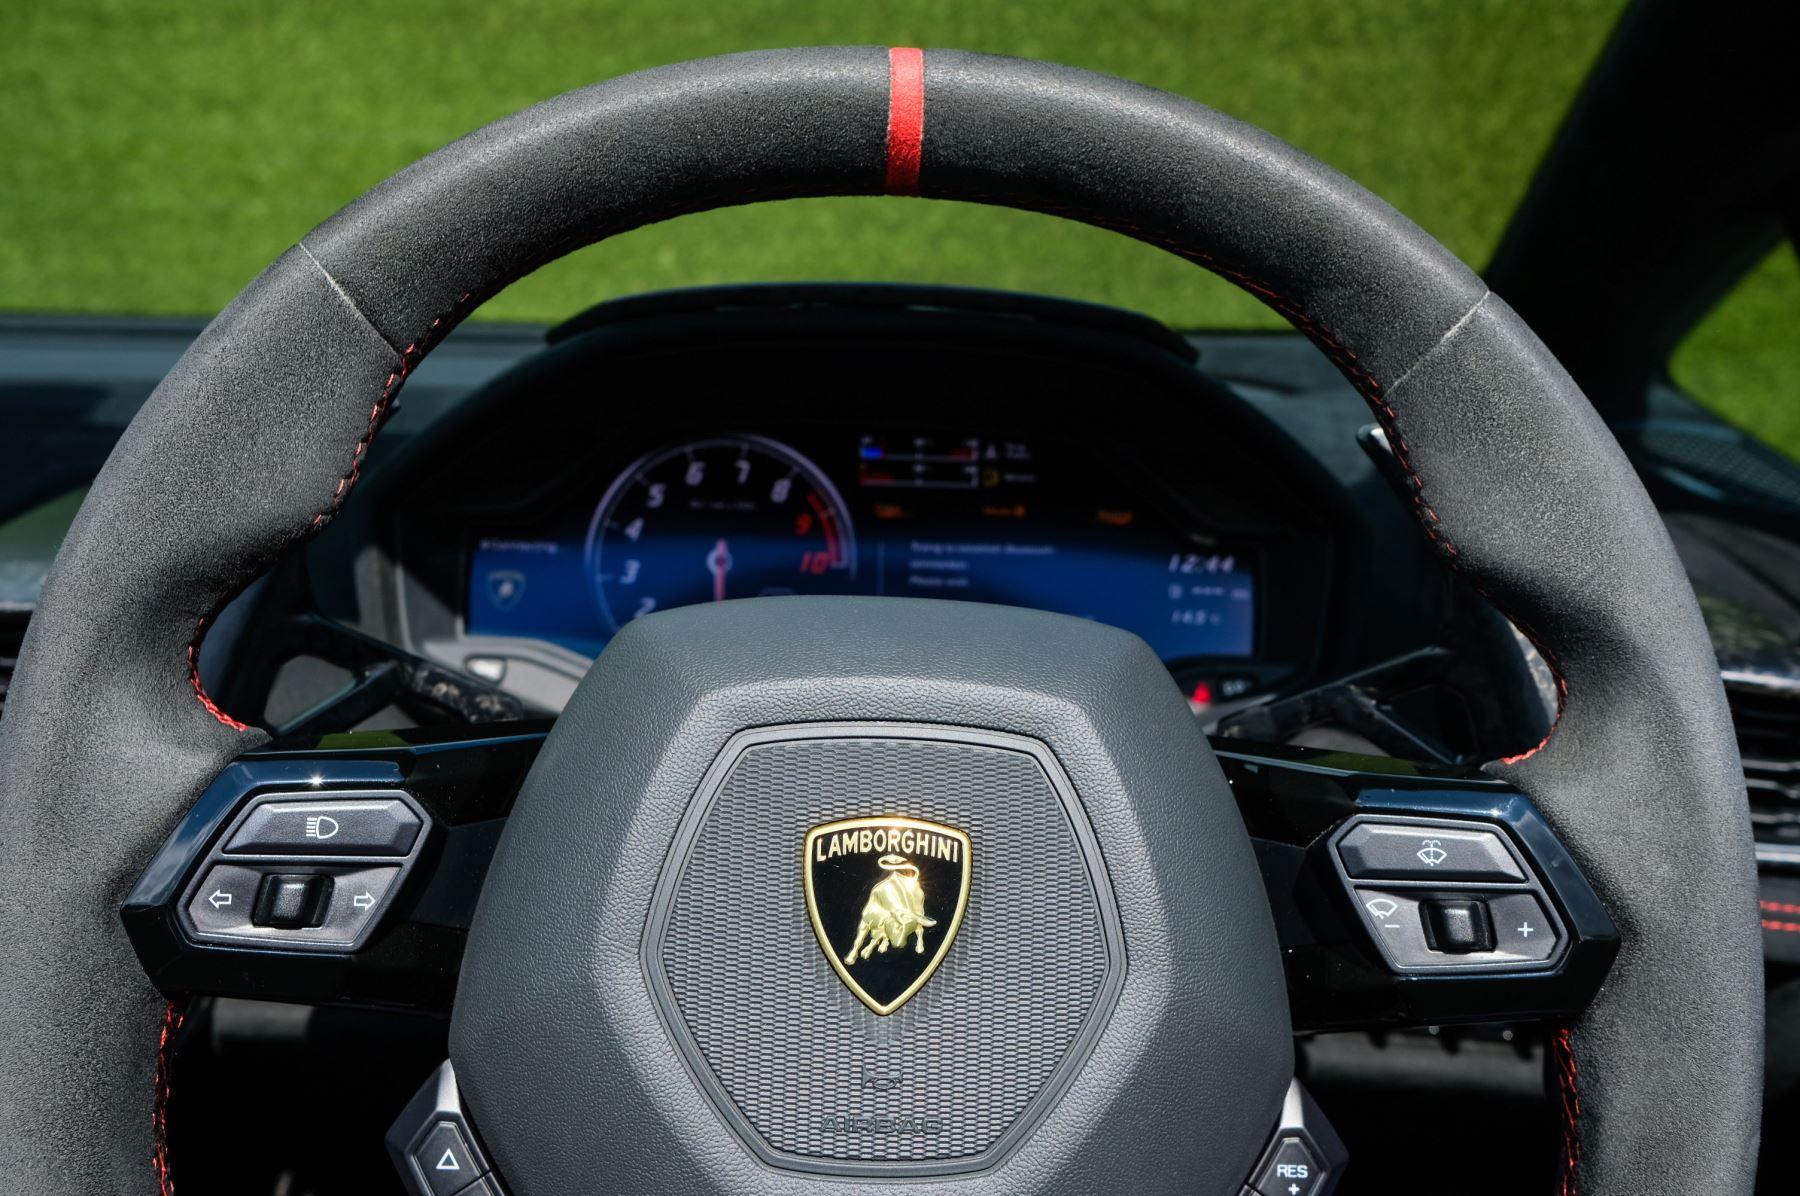 Lamborghini Huracan Performante Spyder 5.2 V10 AWD image 15